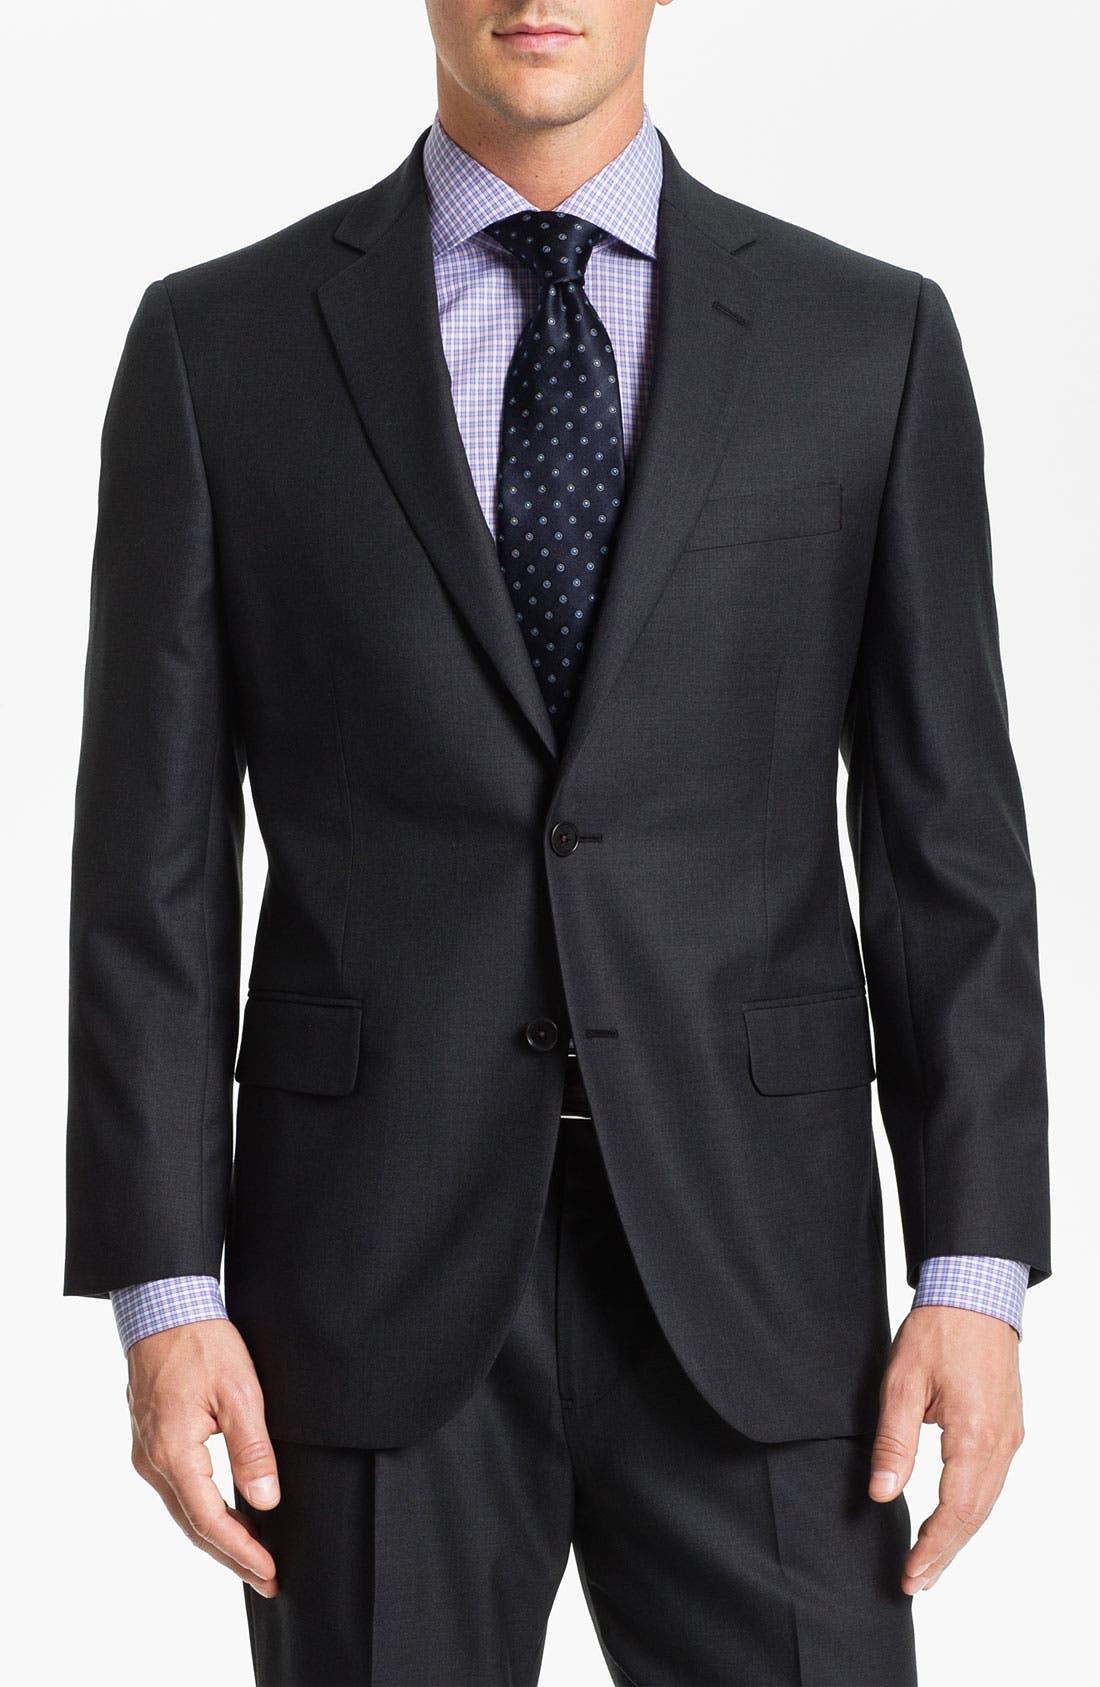 Alternate Image 1 Selected - Brooks Brothers 'Madison' Wool Suit